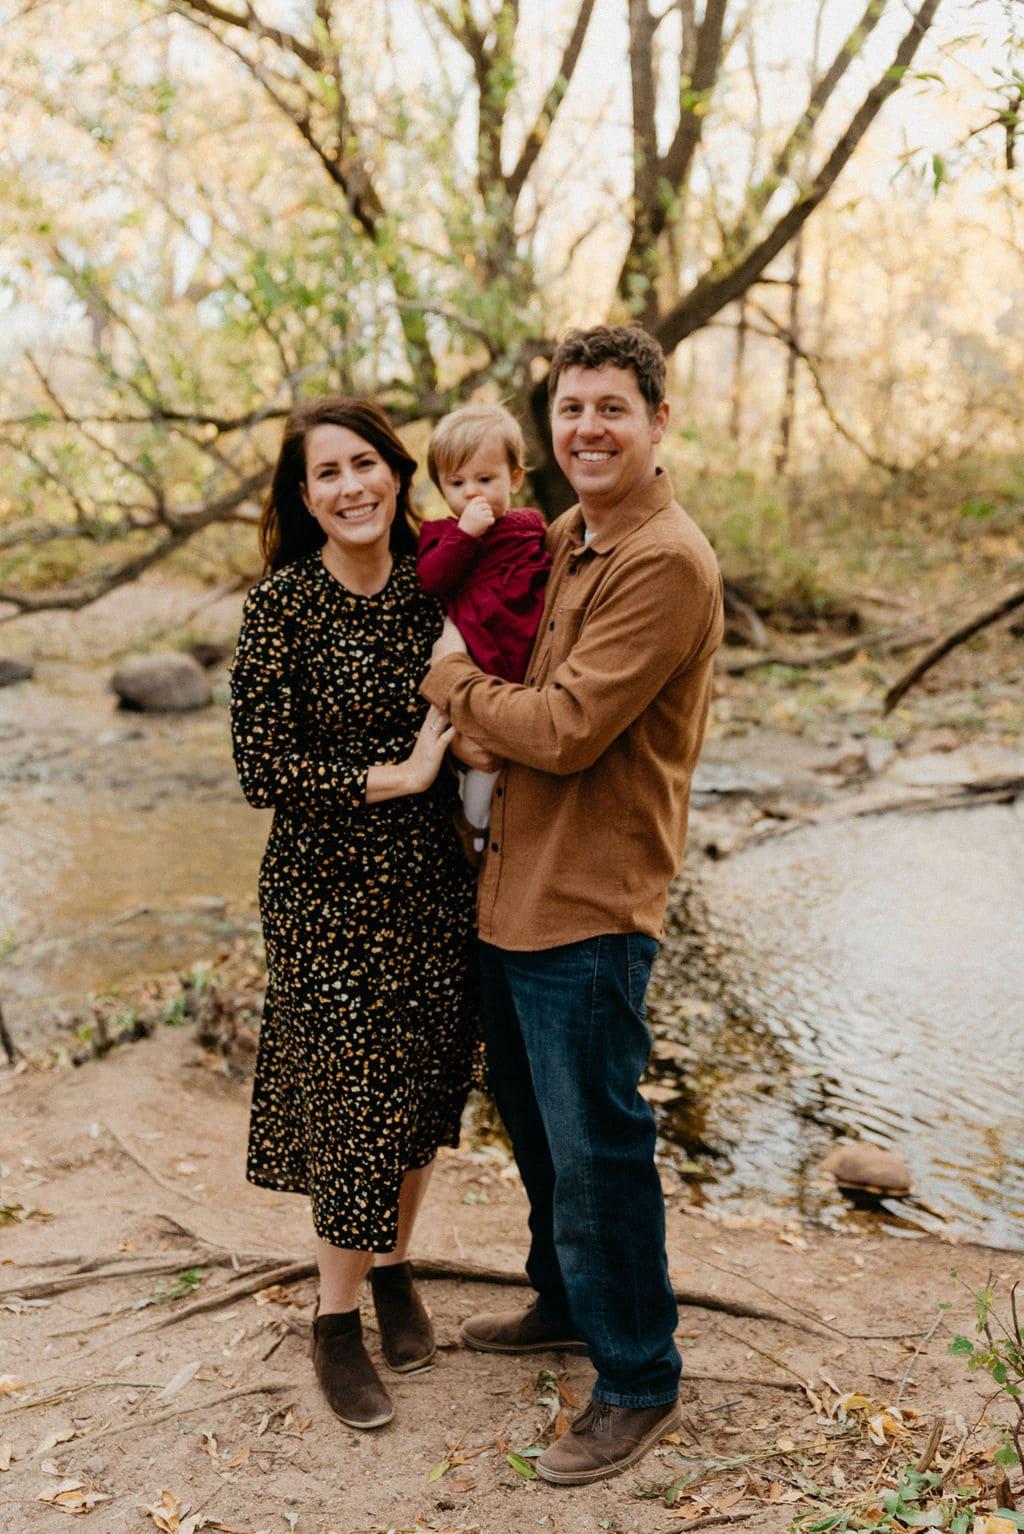 Boulder Family session at sunrise near a creek in boulder